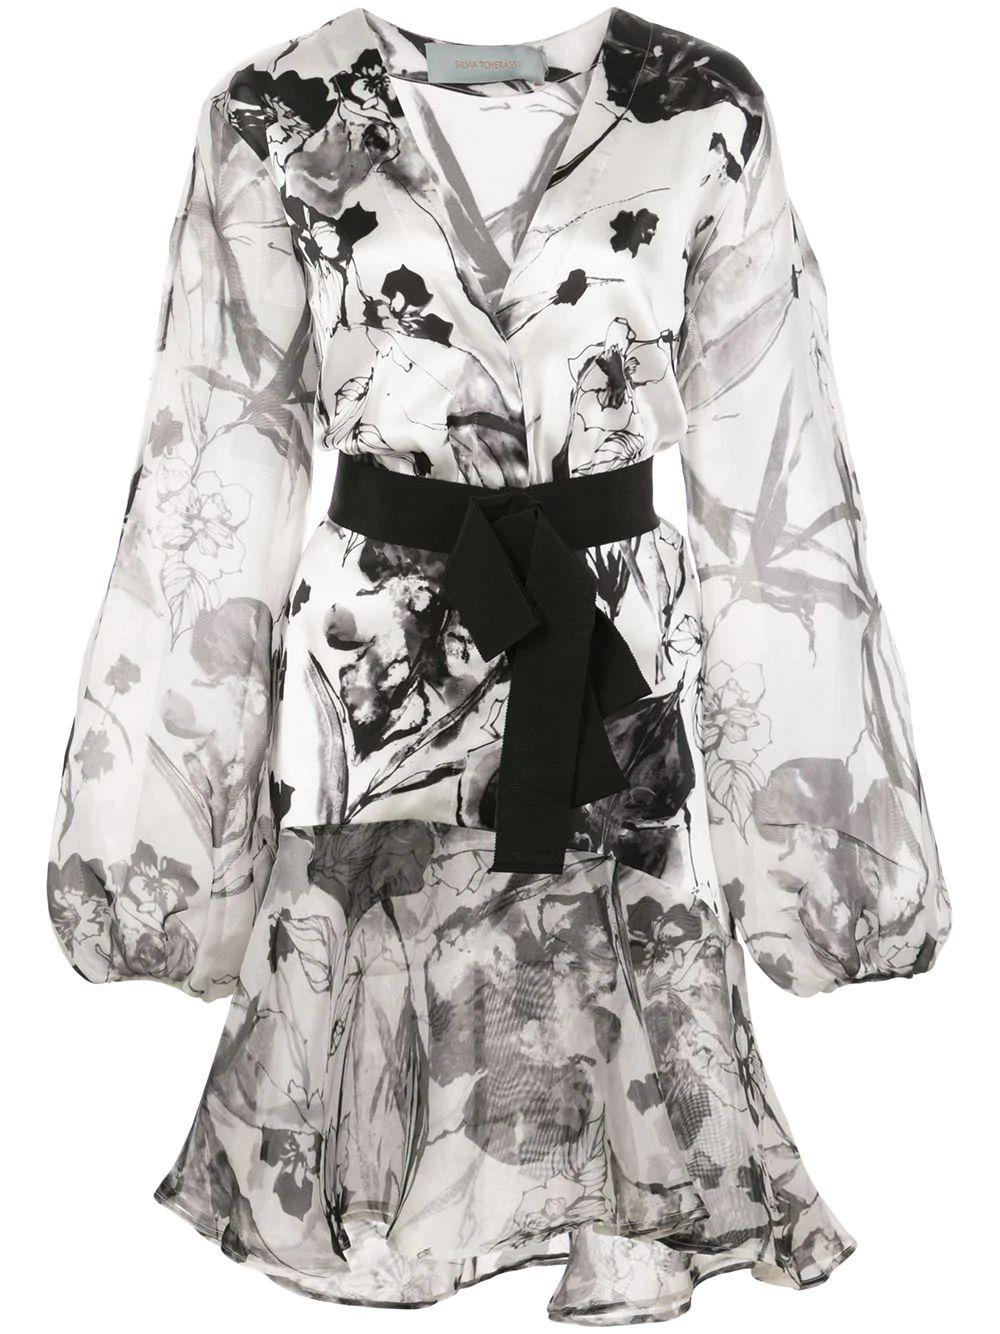 Long Sleeve Floral Printed Dress With Belt Item # GALENA-DRESS